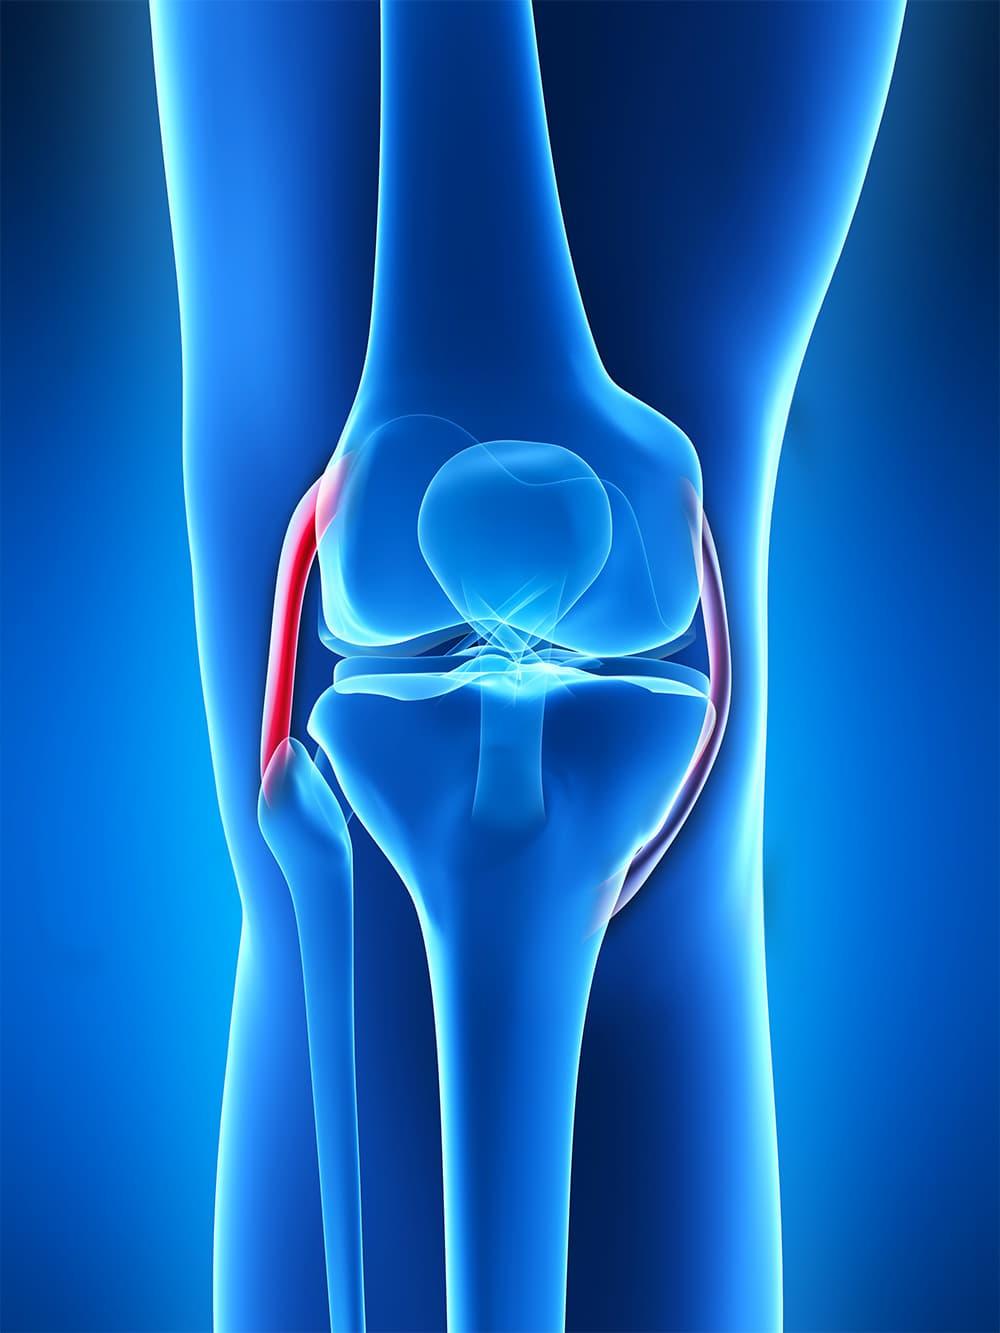 Schema descriptif du ligament collatéral latéral